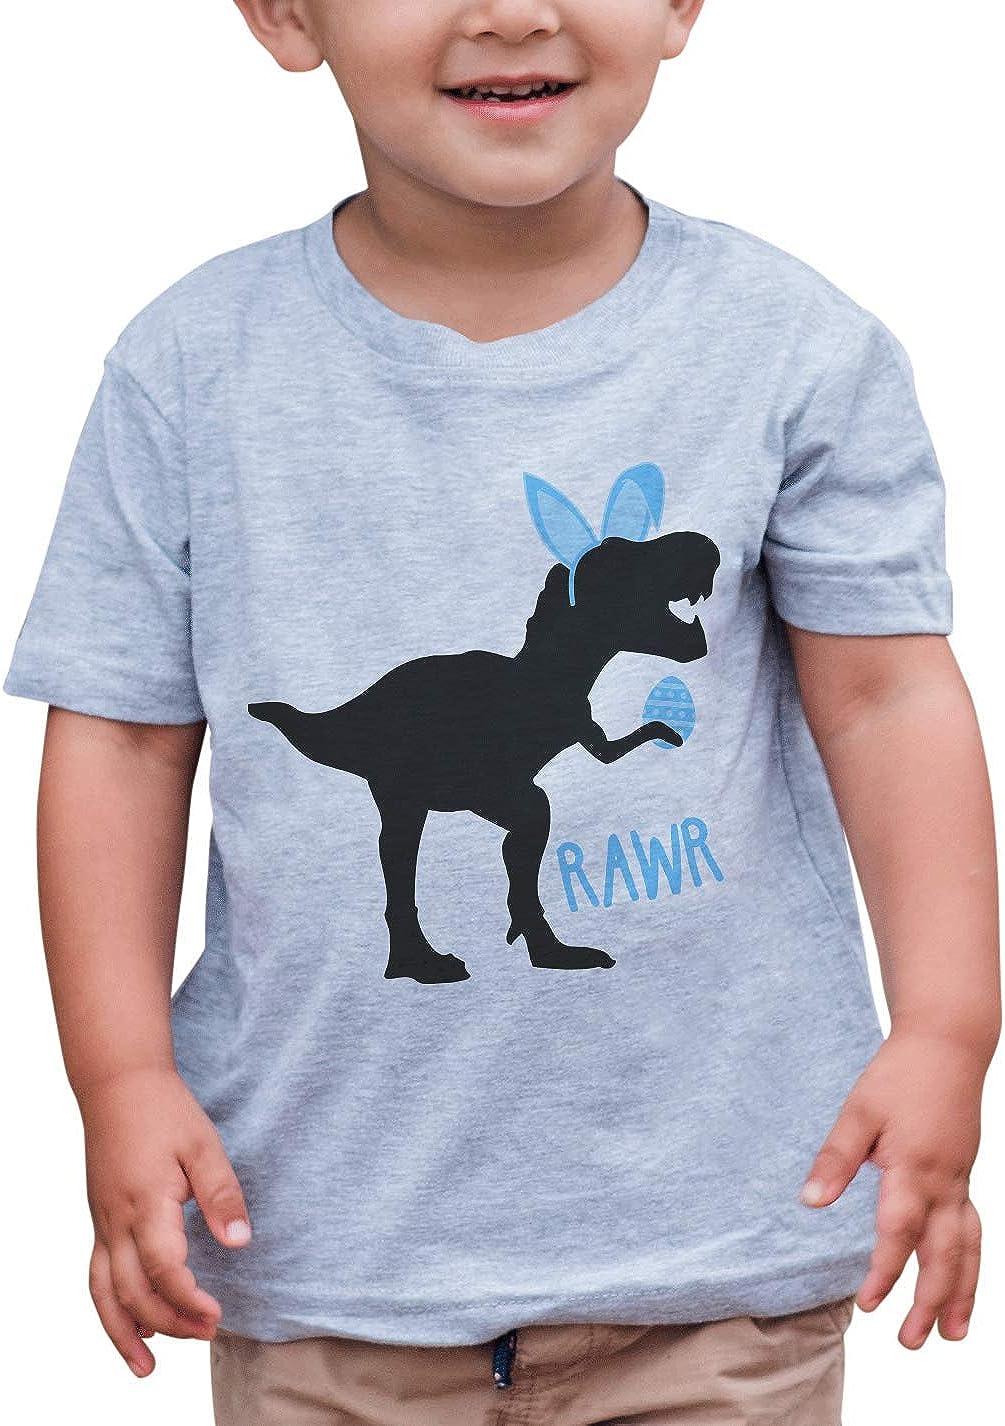 7 ate 9 Apparel Boys Easter Dinosaur T-Shirt